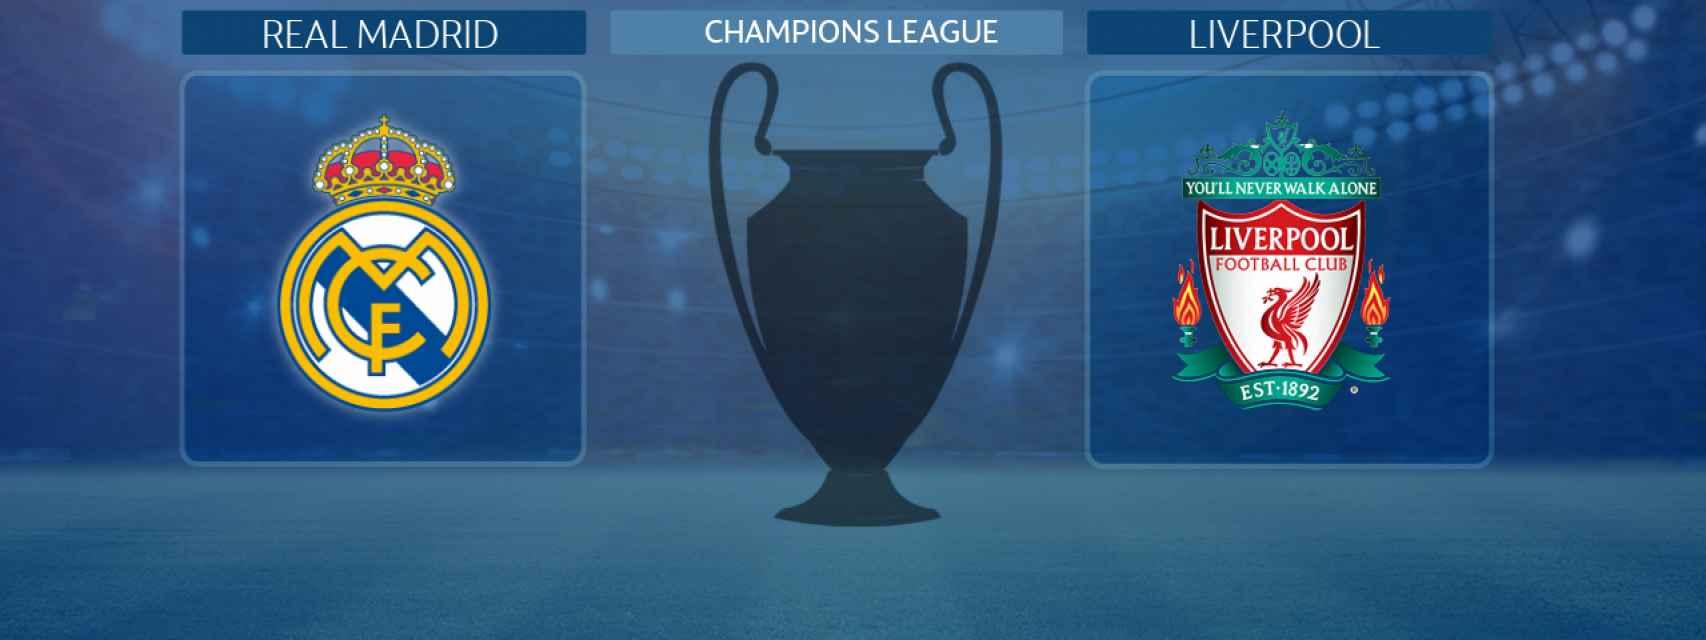 Real Madrid - Liverpool, partido de la Champions League